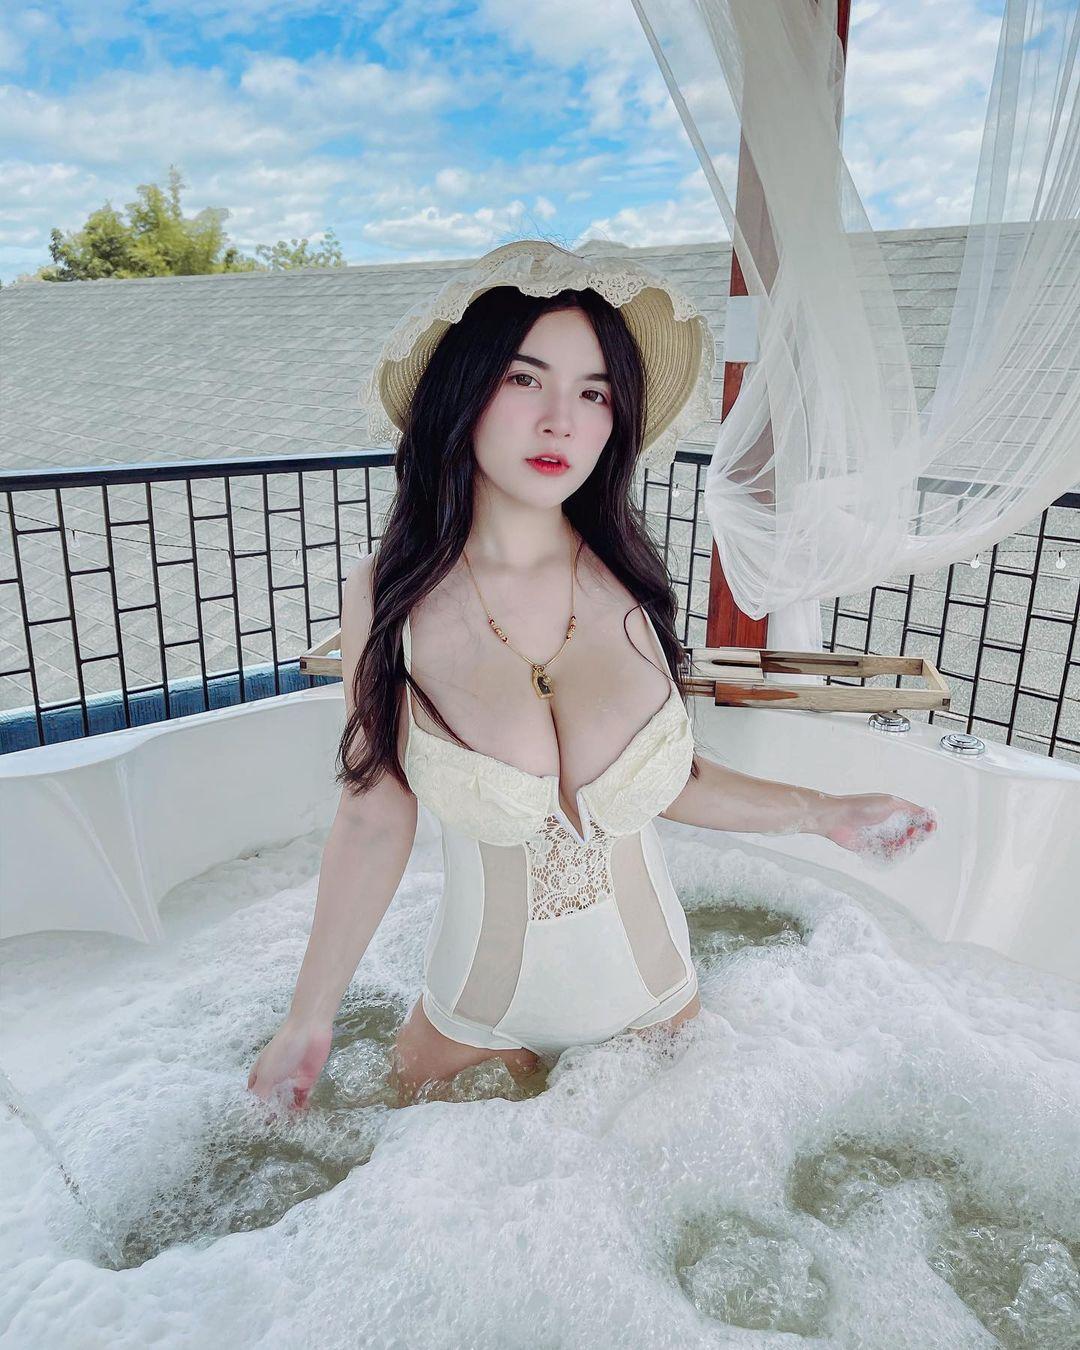 Wanvisa Yodprasart, Selebgram Thailand dengan Payudara Jumbo